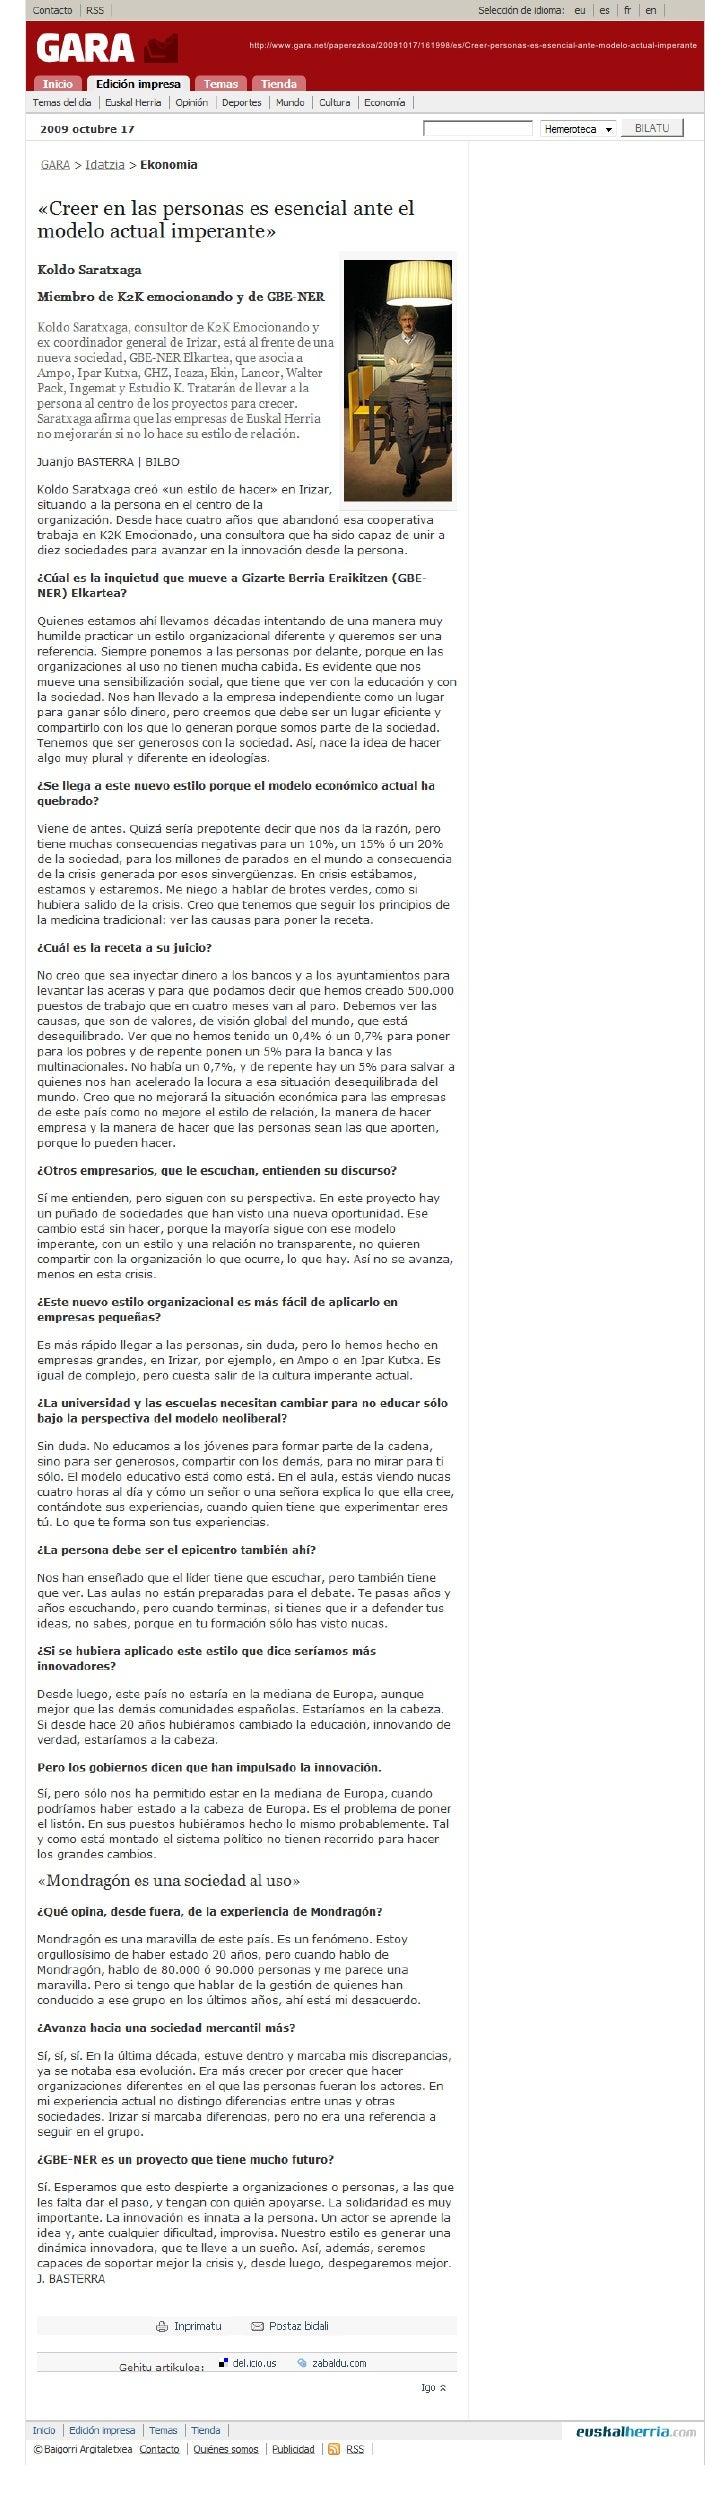 Conlaclo     RSS    GARA                                            http://www.gara.net/paperezkoa/20091017/161998/es/Cree...